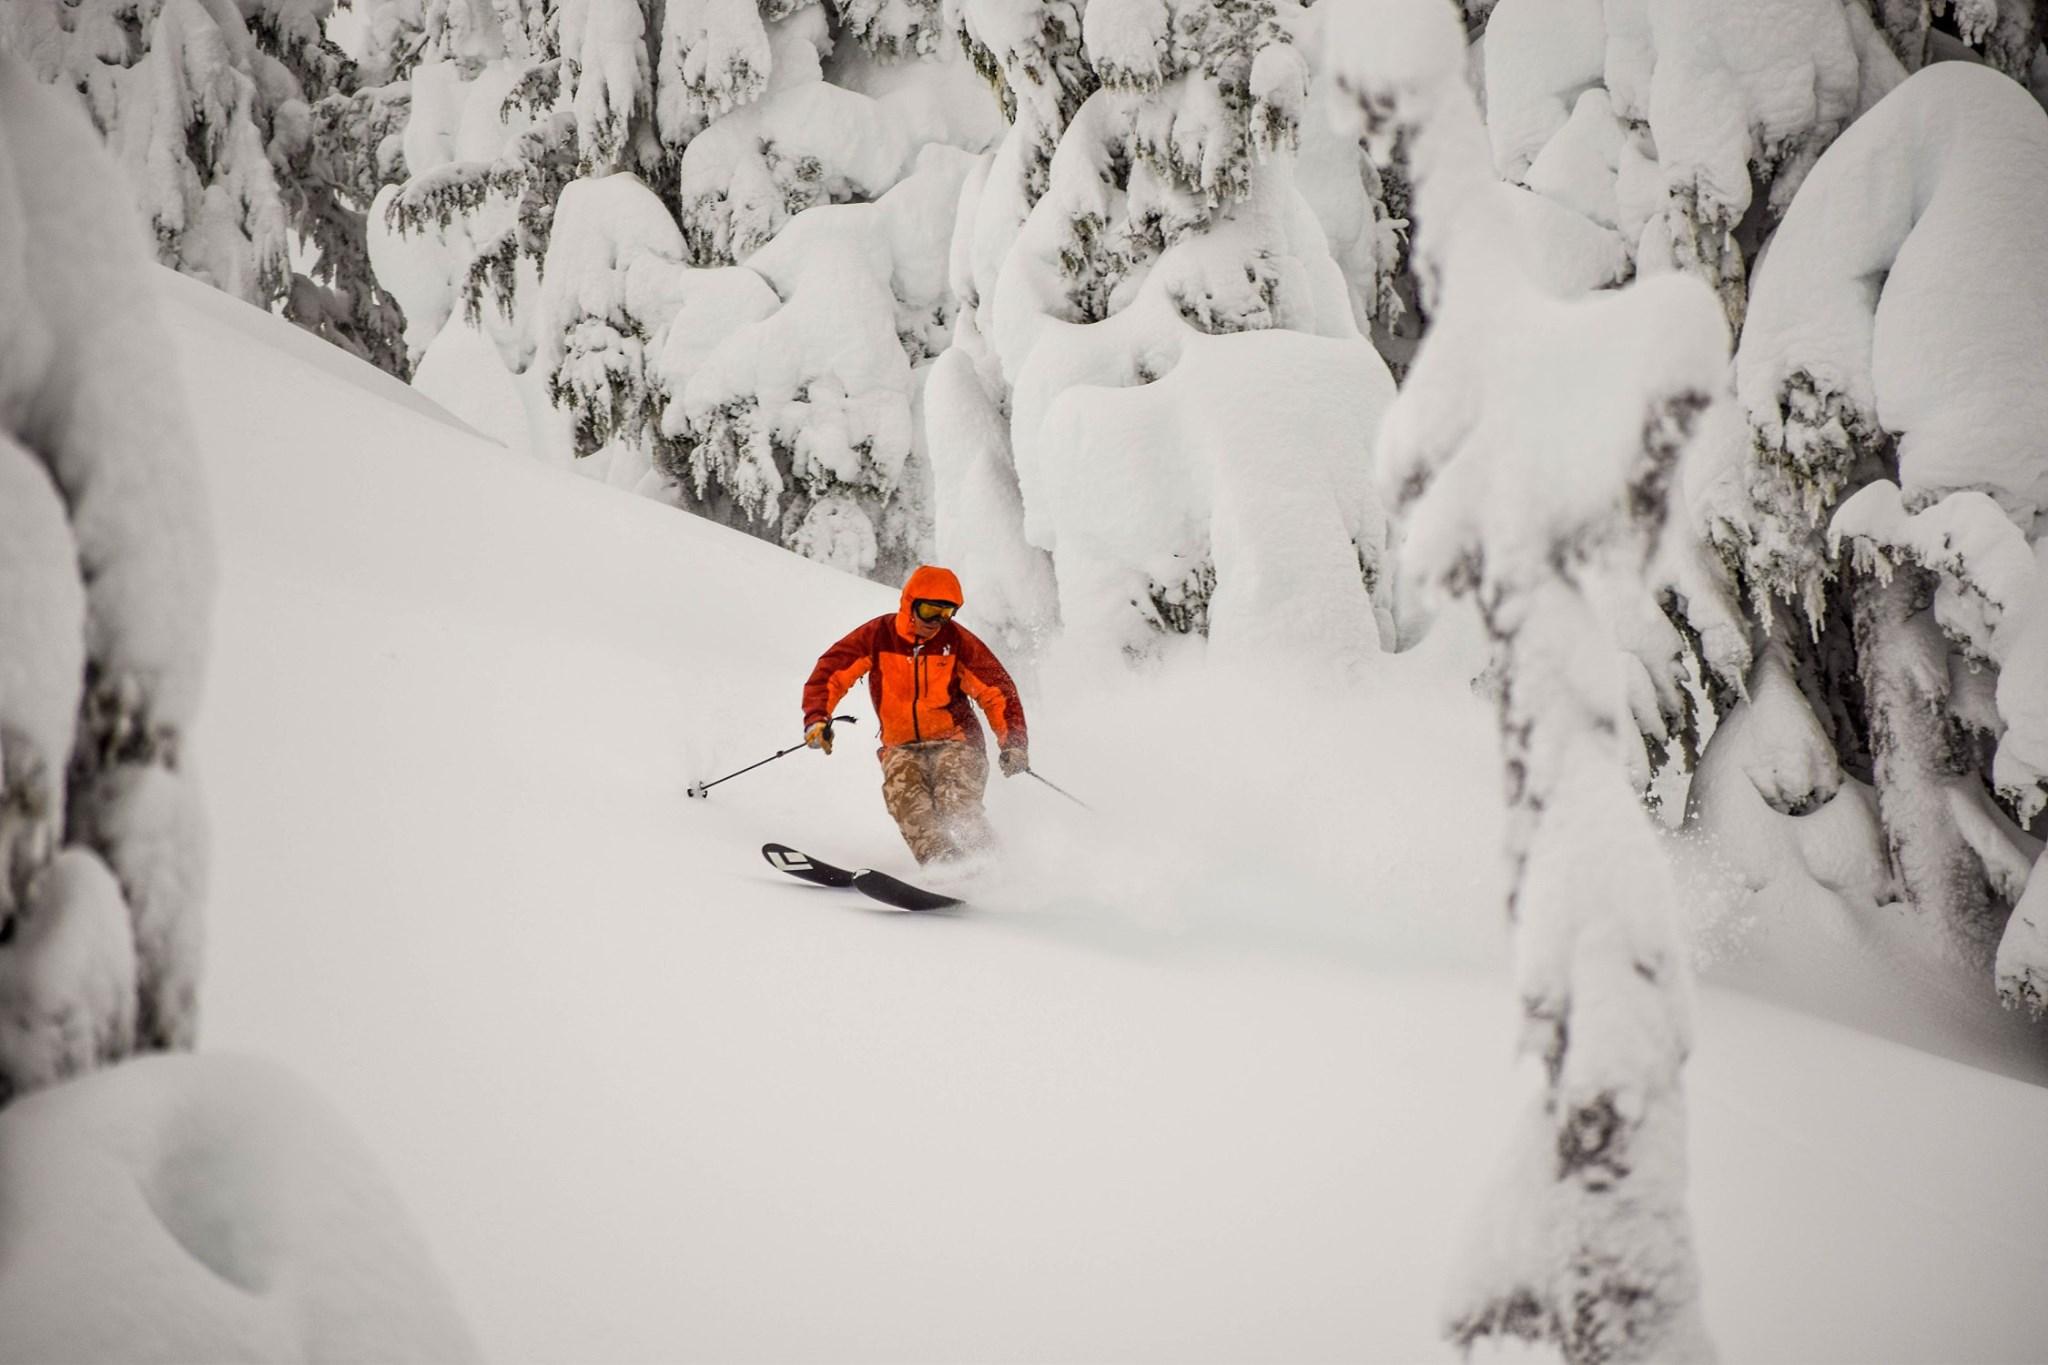 Eaglecrest Ski Area Справочник по курорту